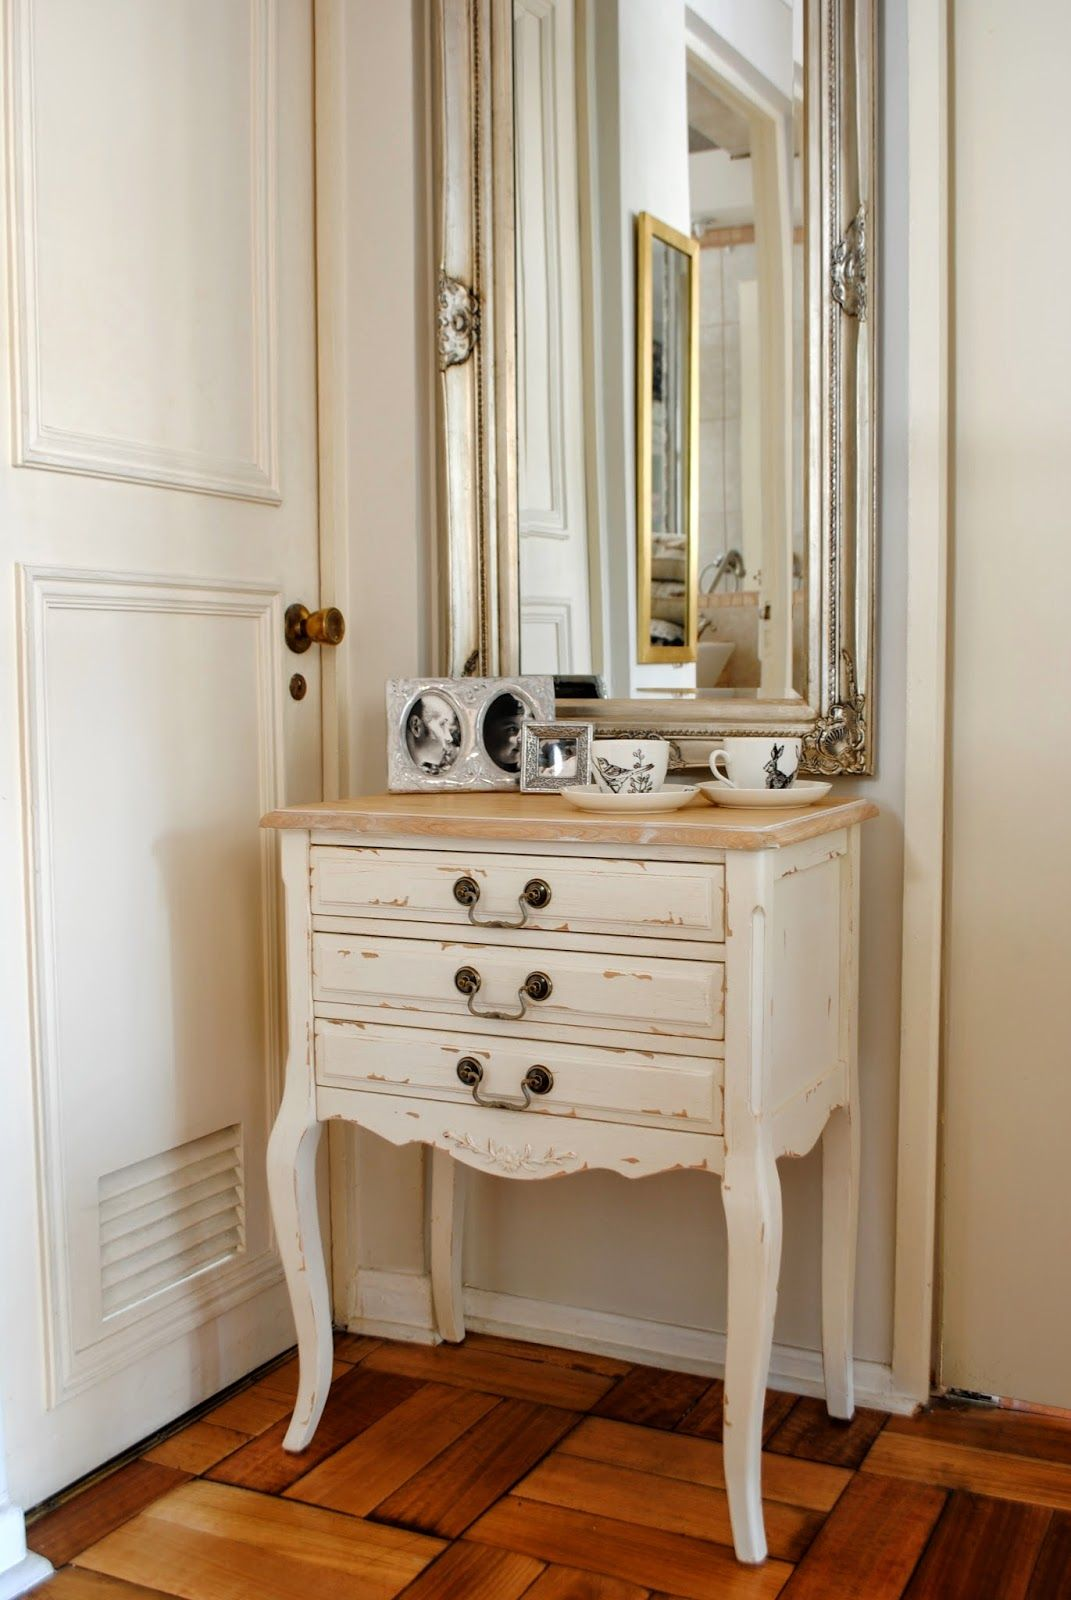 Paz Montealegre | Decoración: Muebles | carpinteria | Pinterest ...